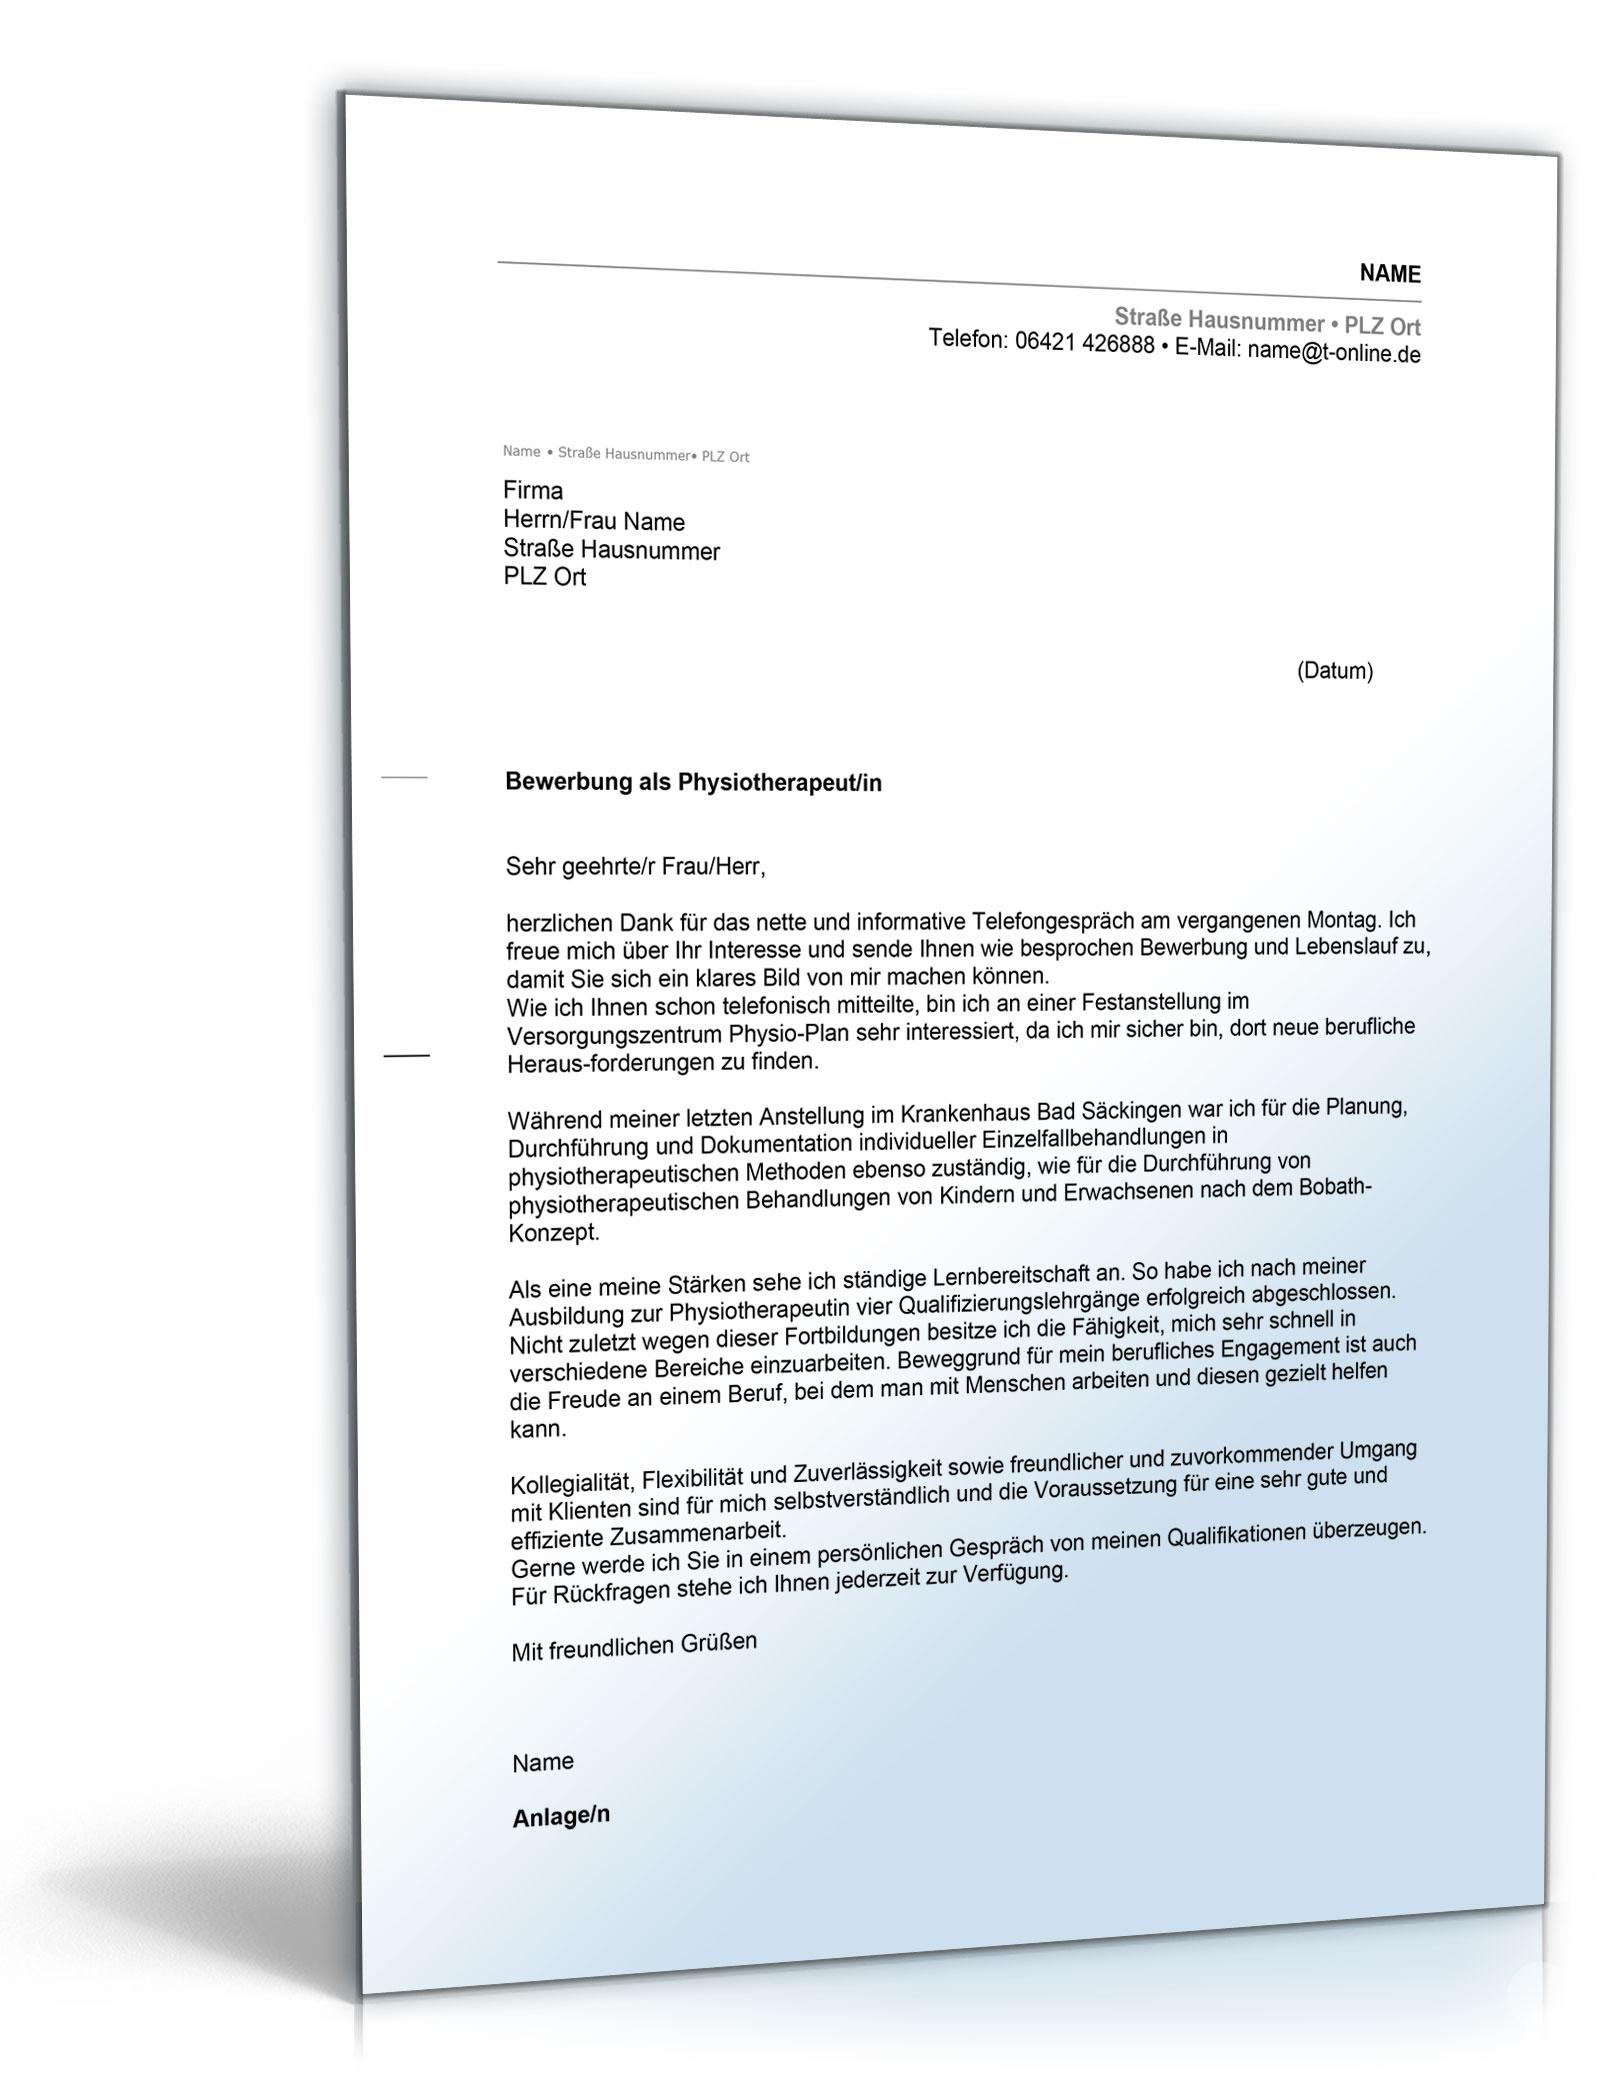 Anschreiben Bewerbung Physiotherapeut [Word Dokument]: Amazon.de ...